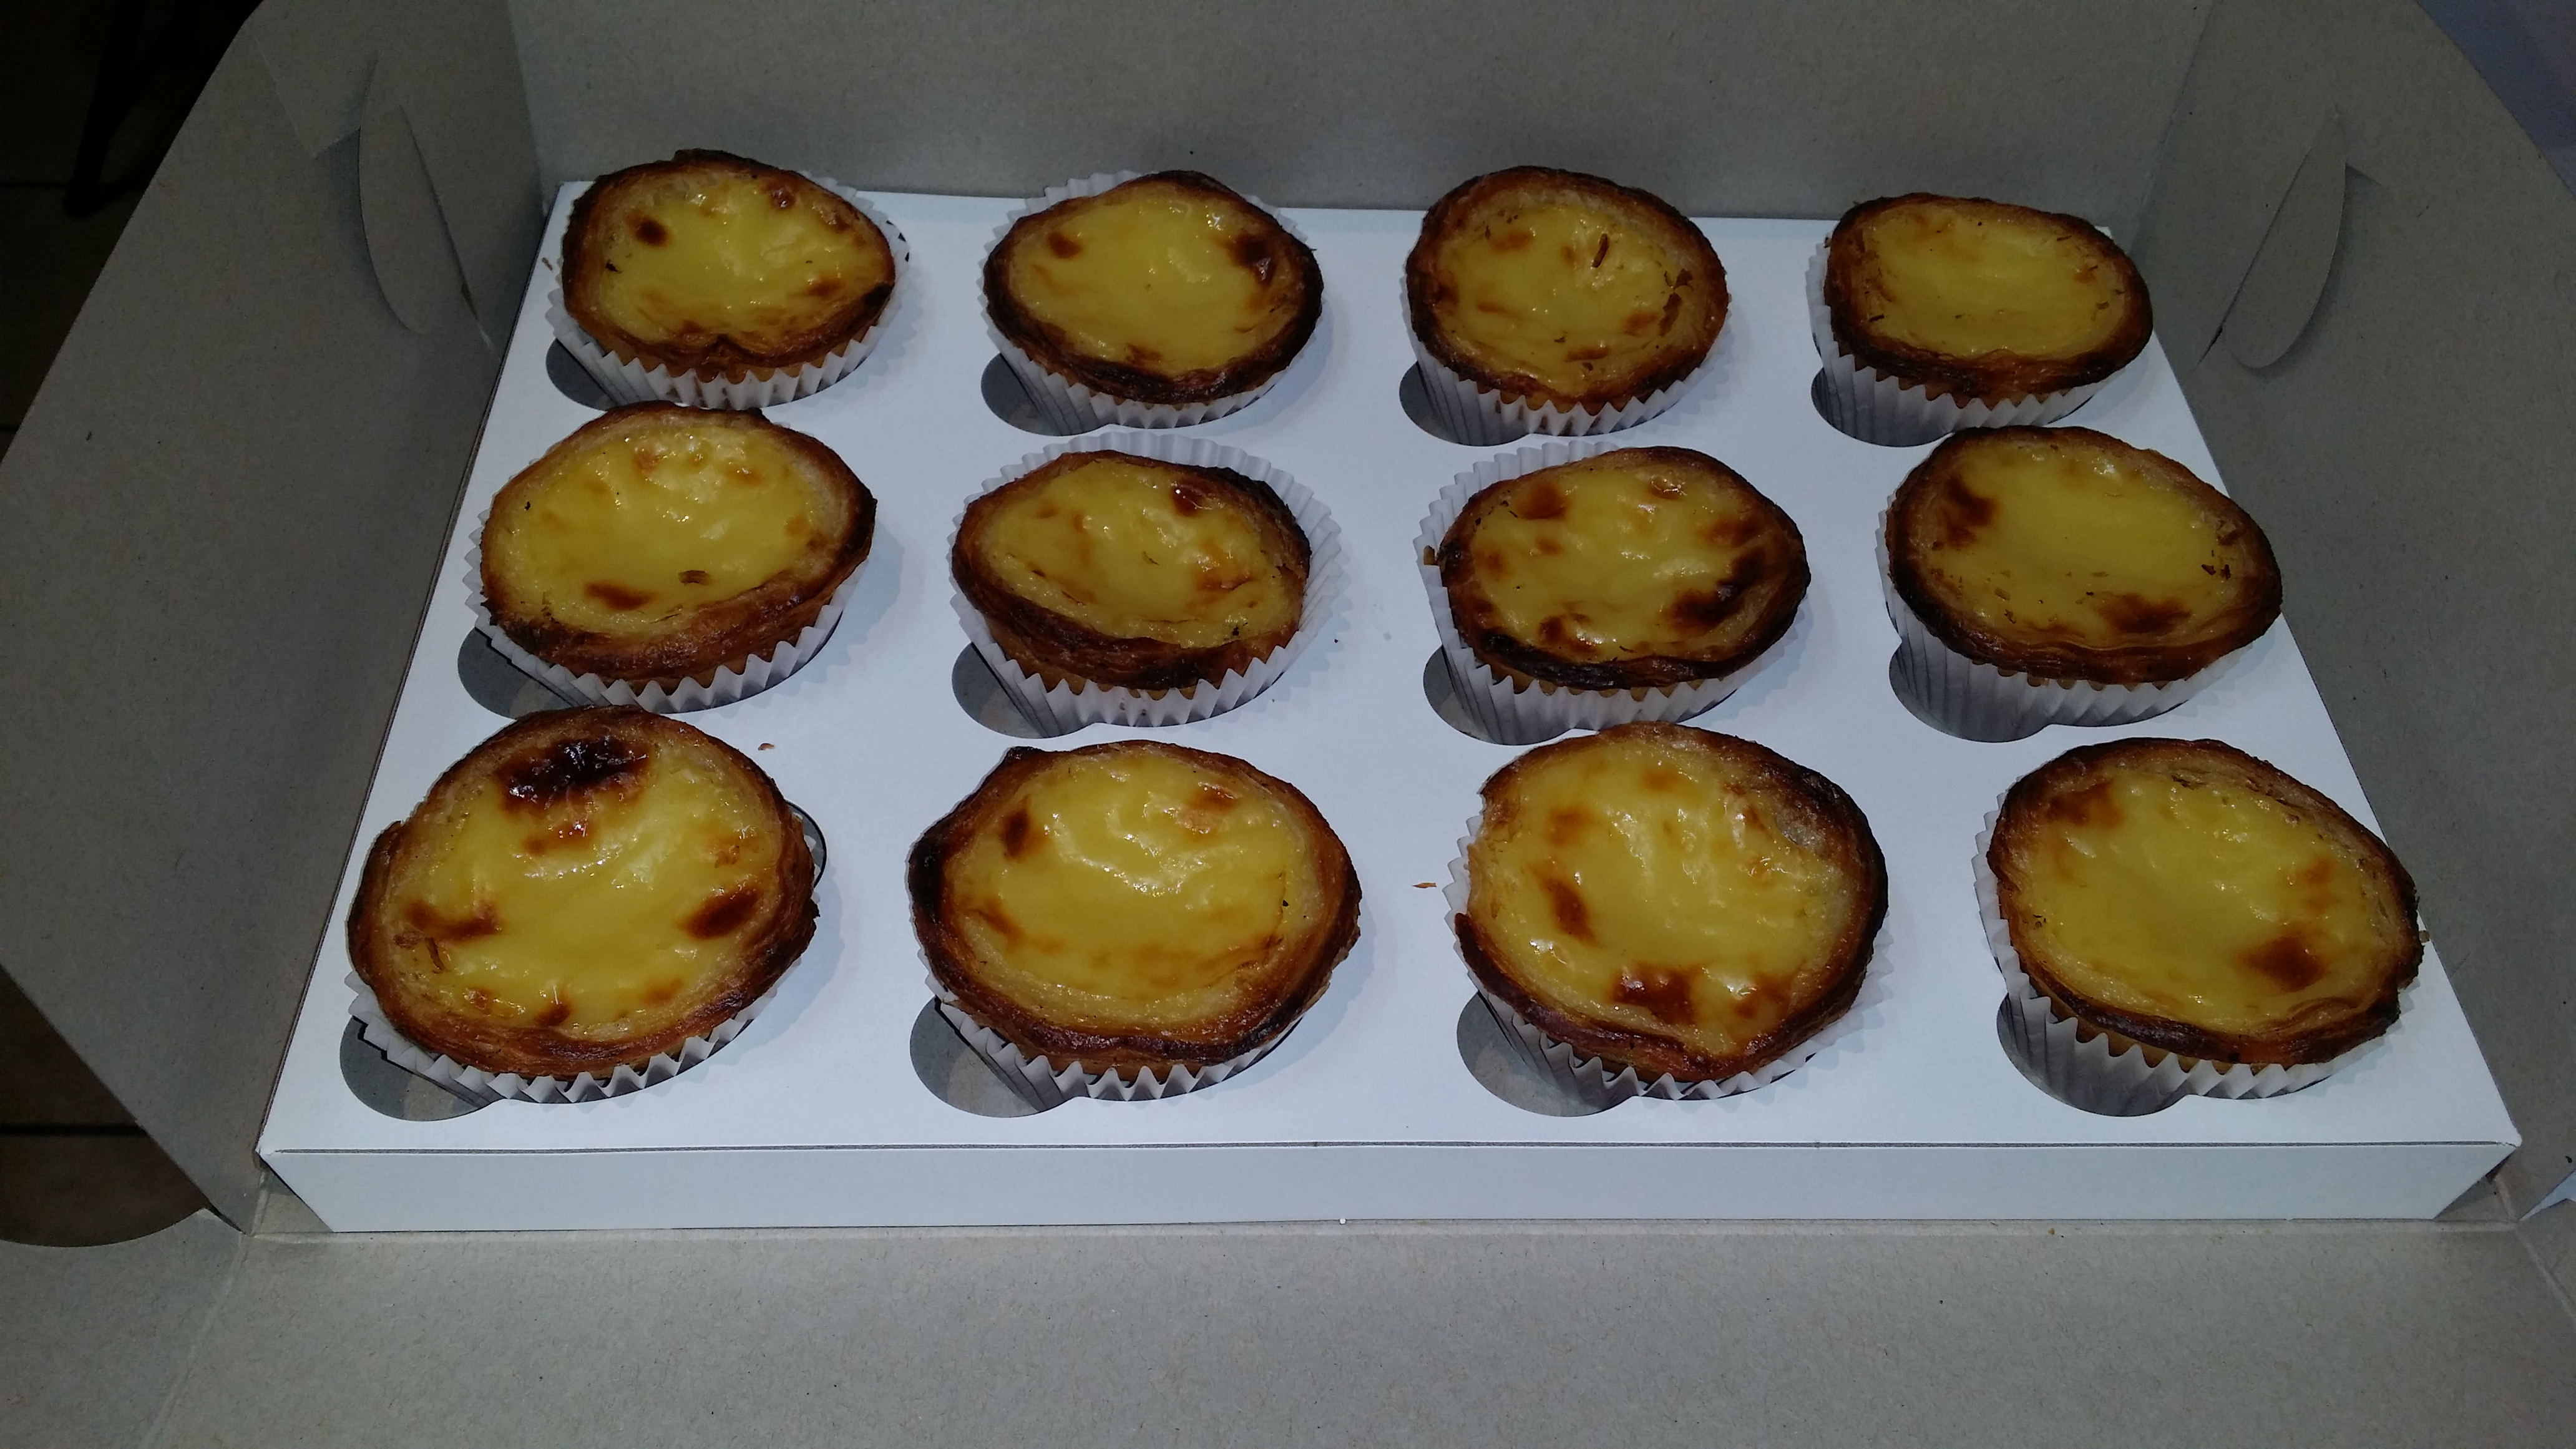 Portuguese Custard Tarts (Natas)